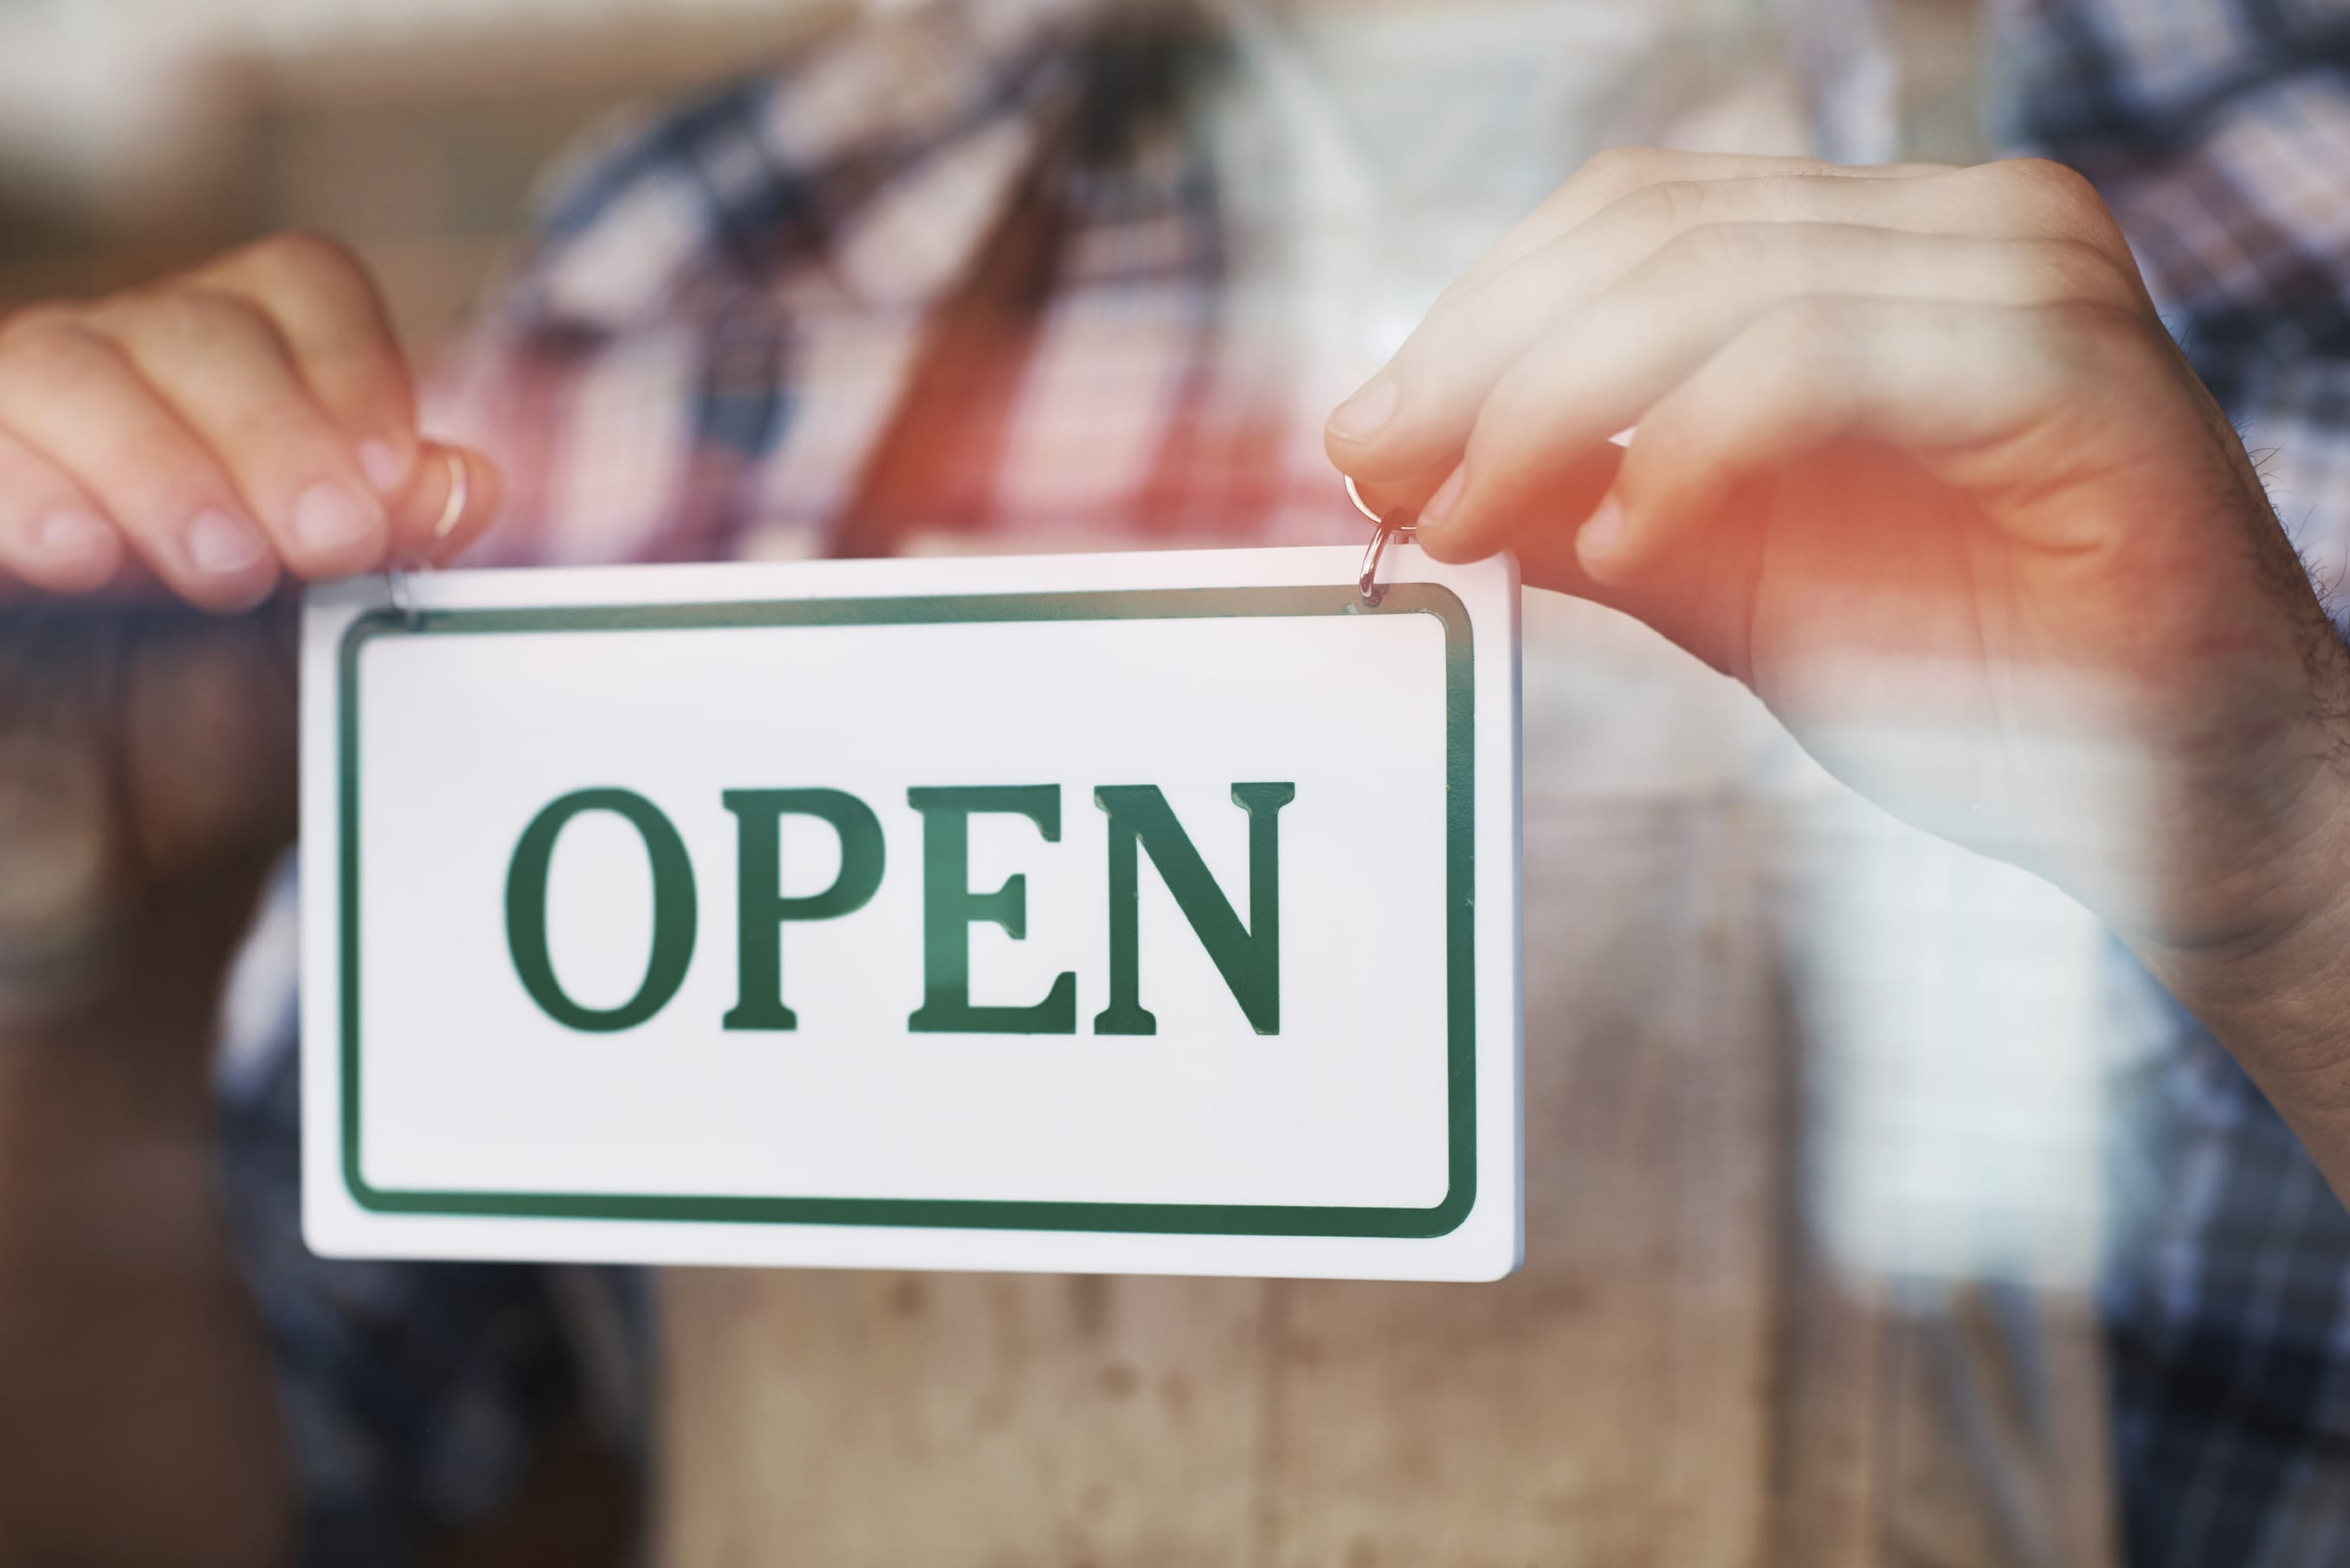 Open_sign_iStock.jpg